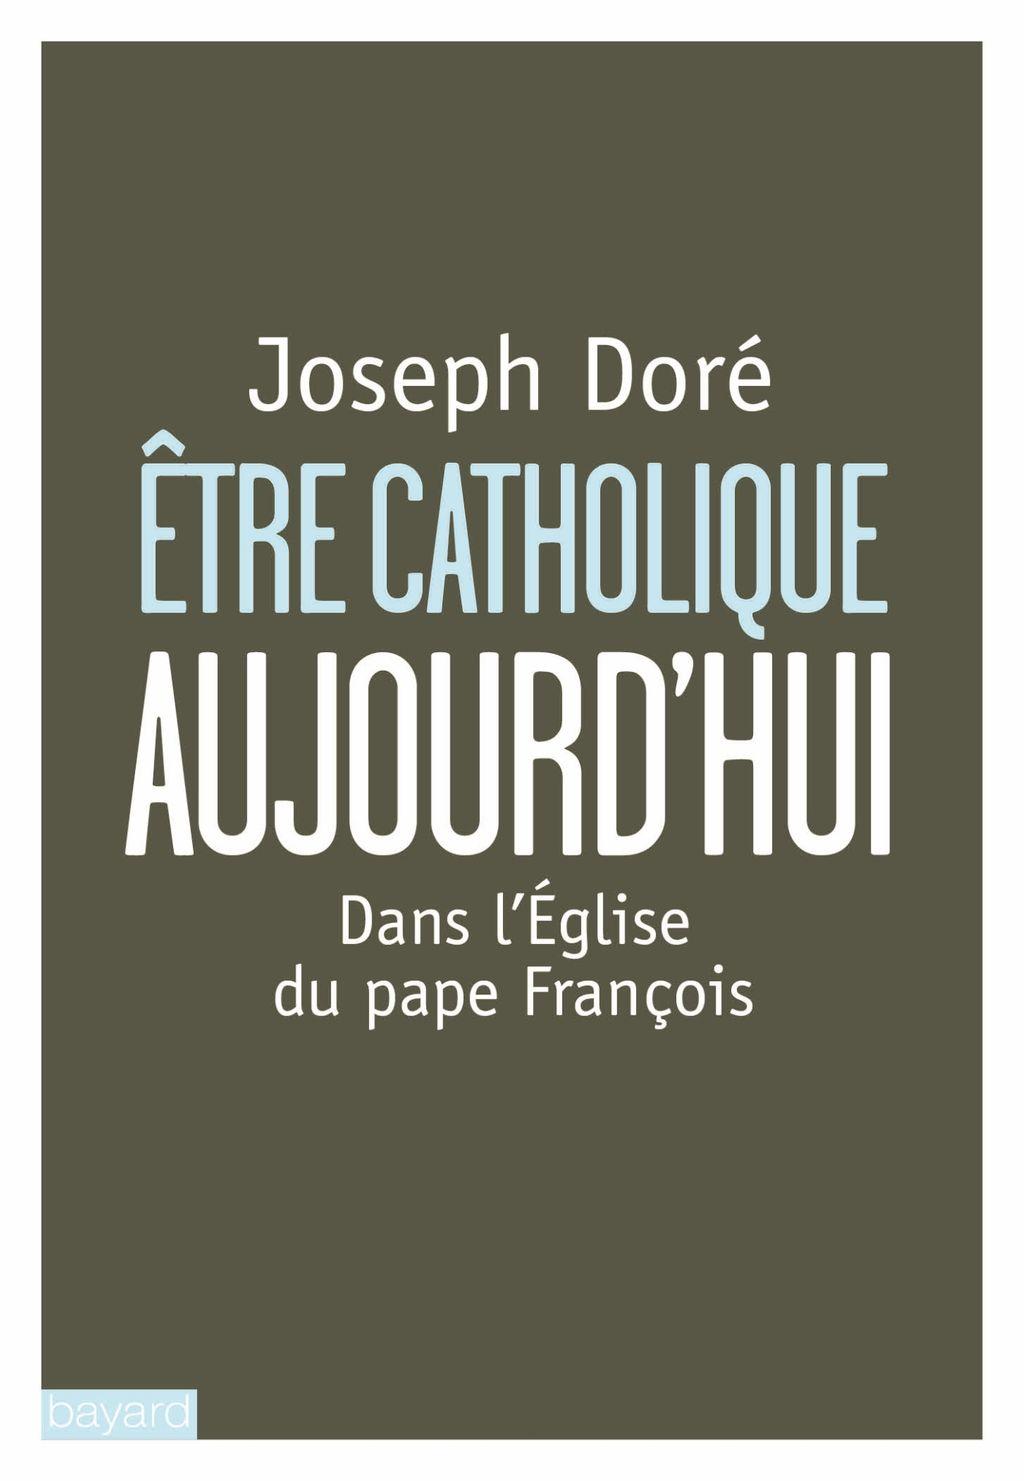 «Etre catholique aujourd'hui» cover